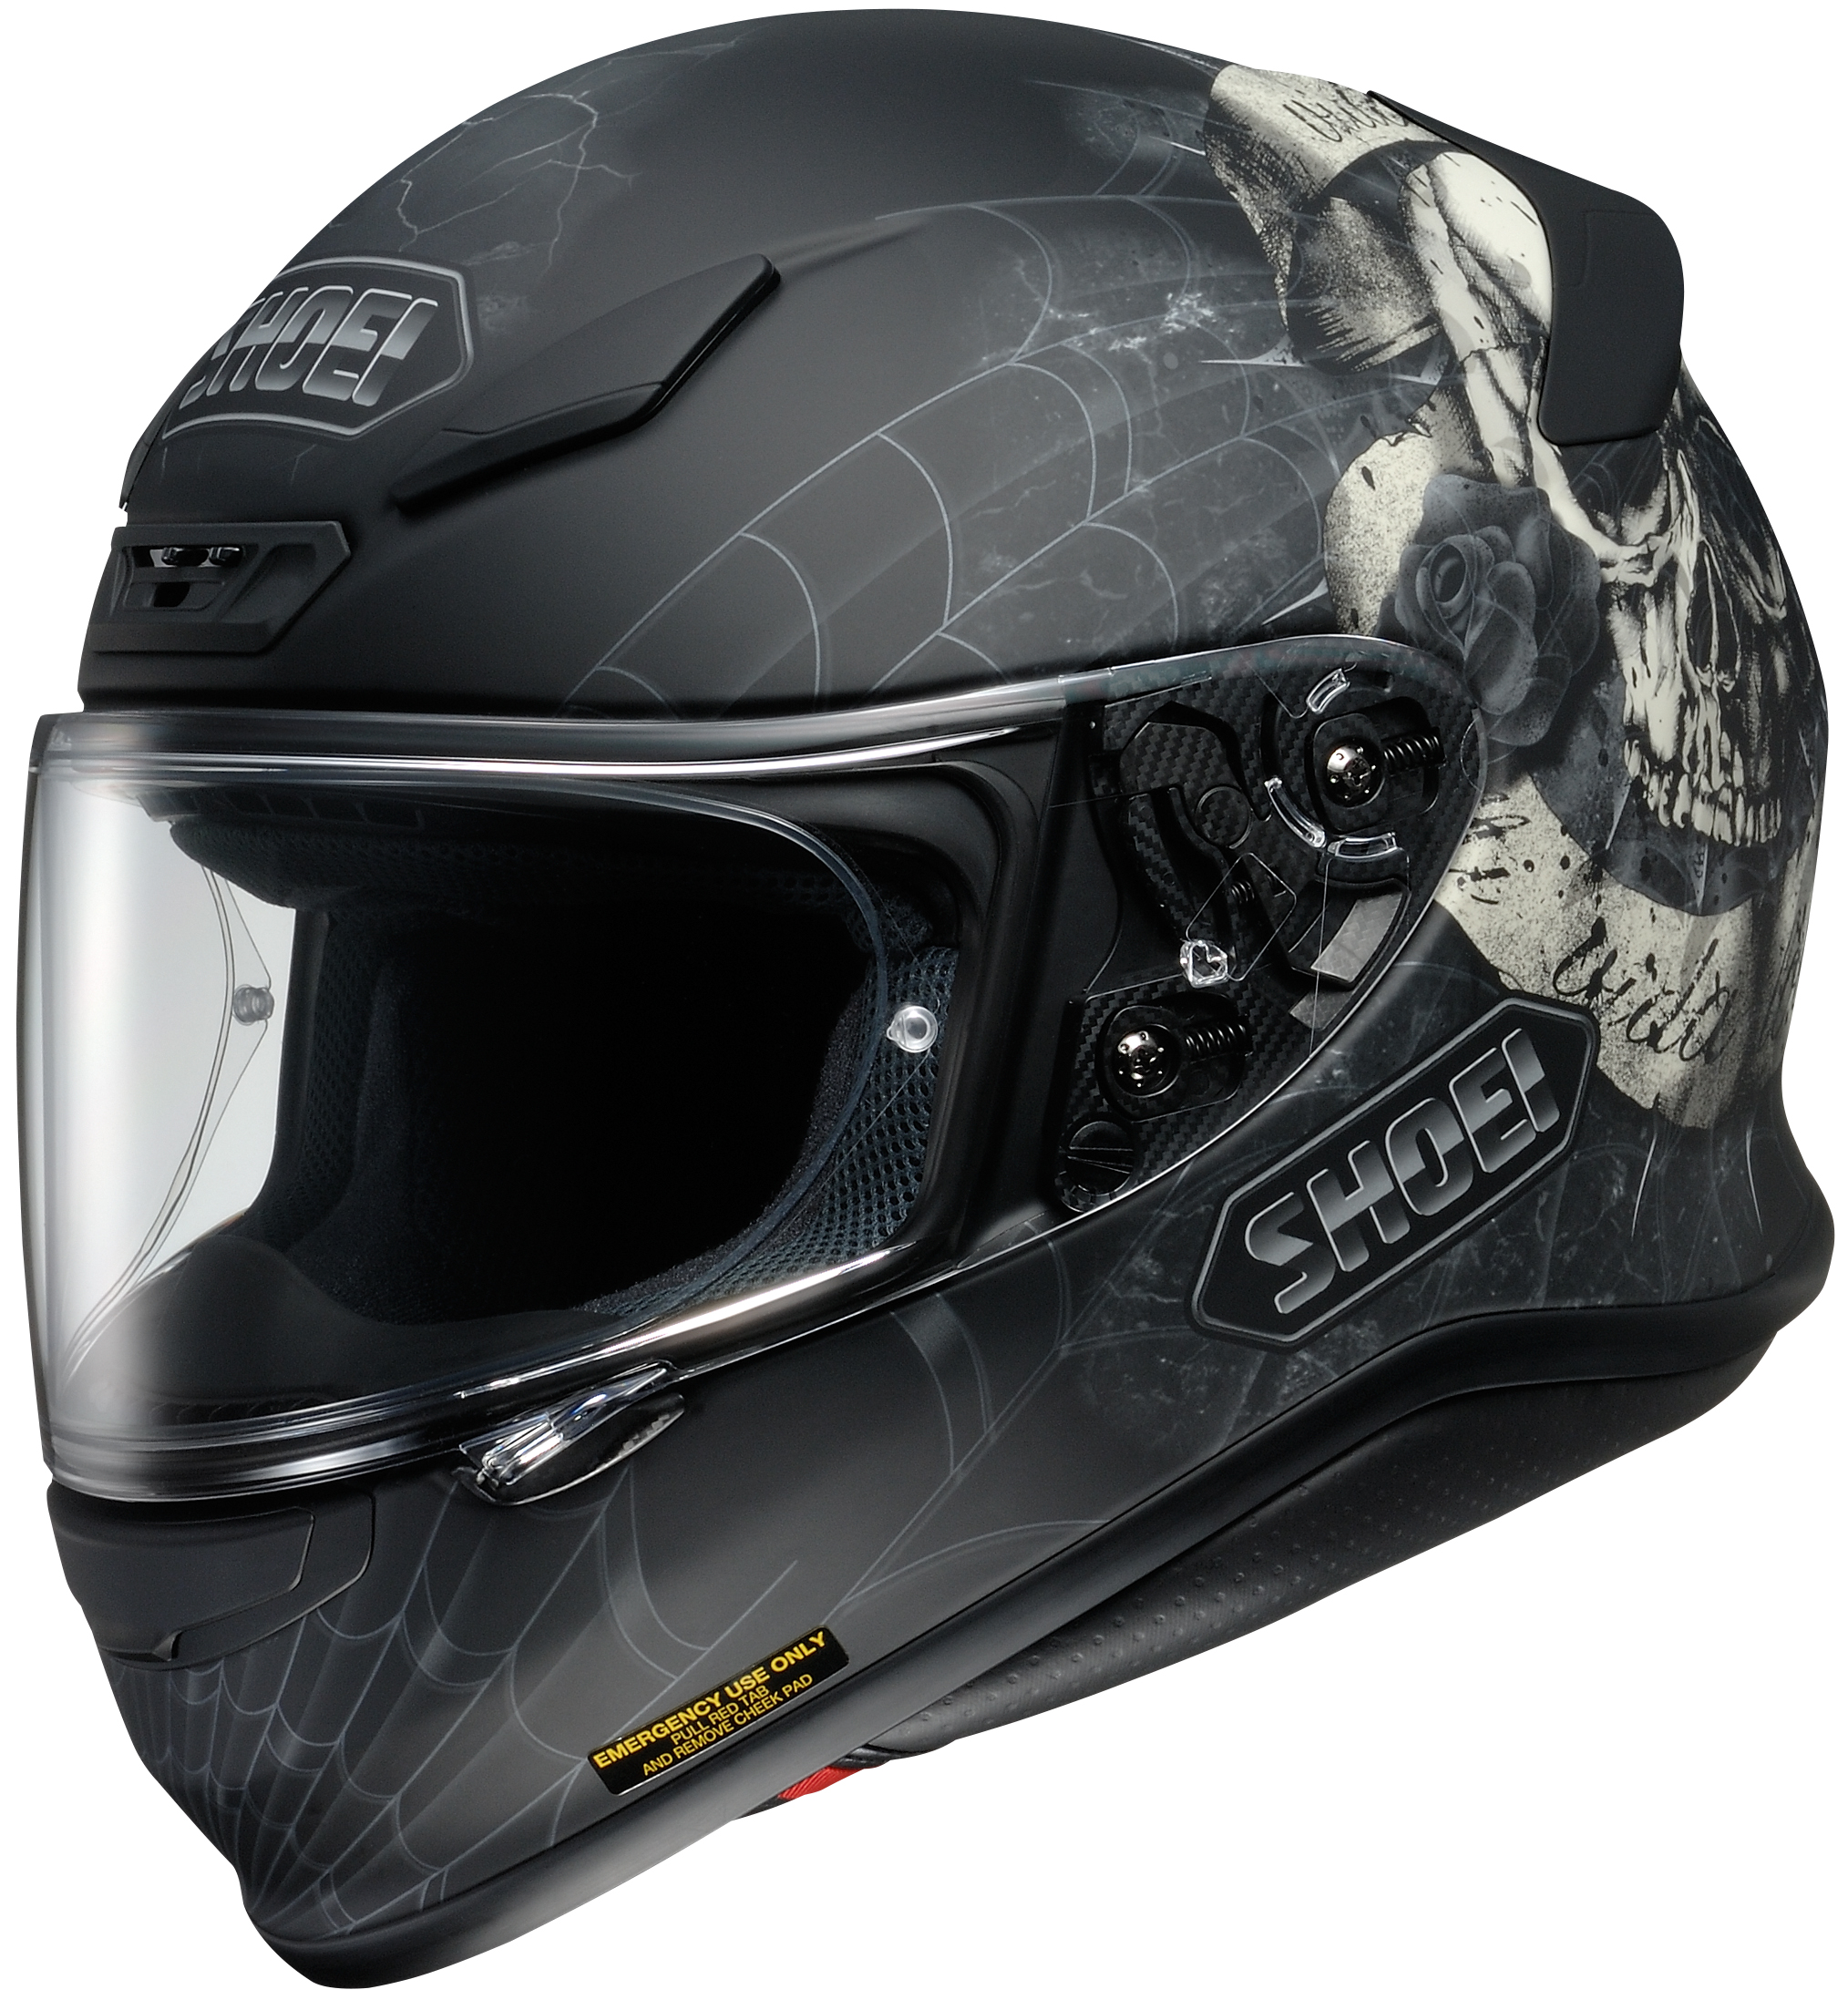 RF-1200 Brigand Helmet